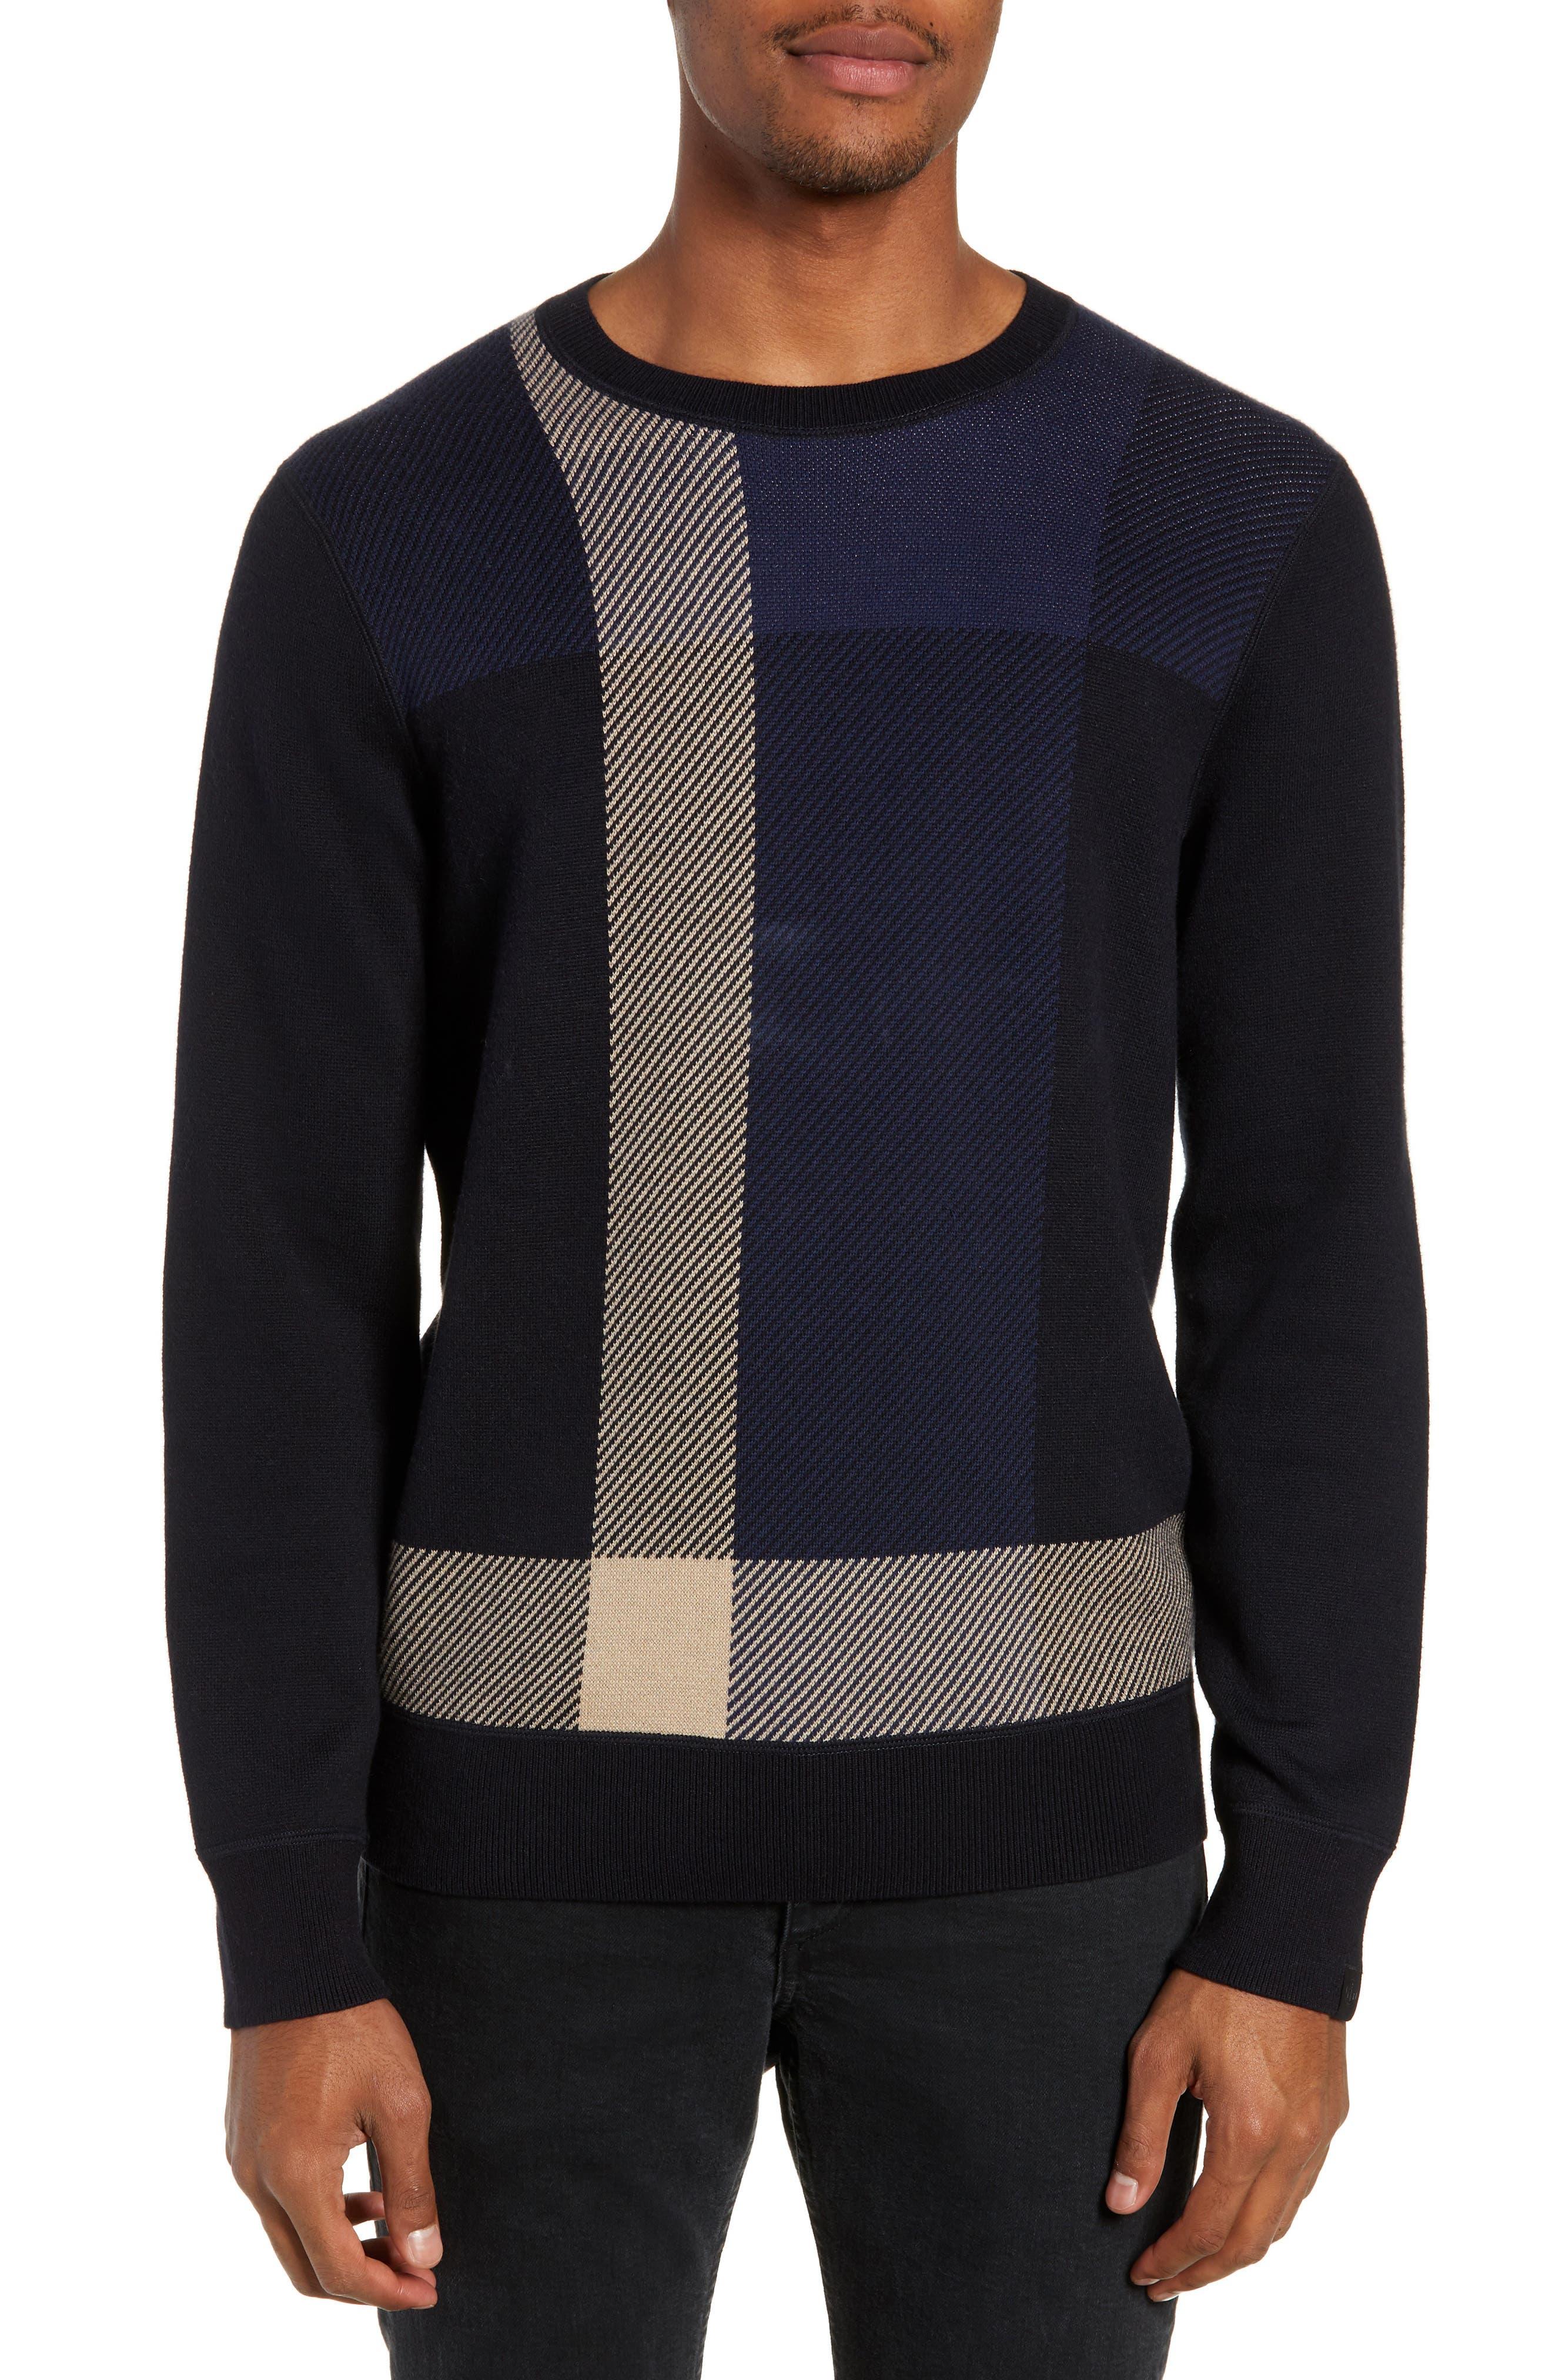 Marshall Crewneck Sweater,                             Main thumbnail 1, color,                             NAVY